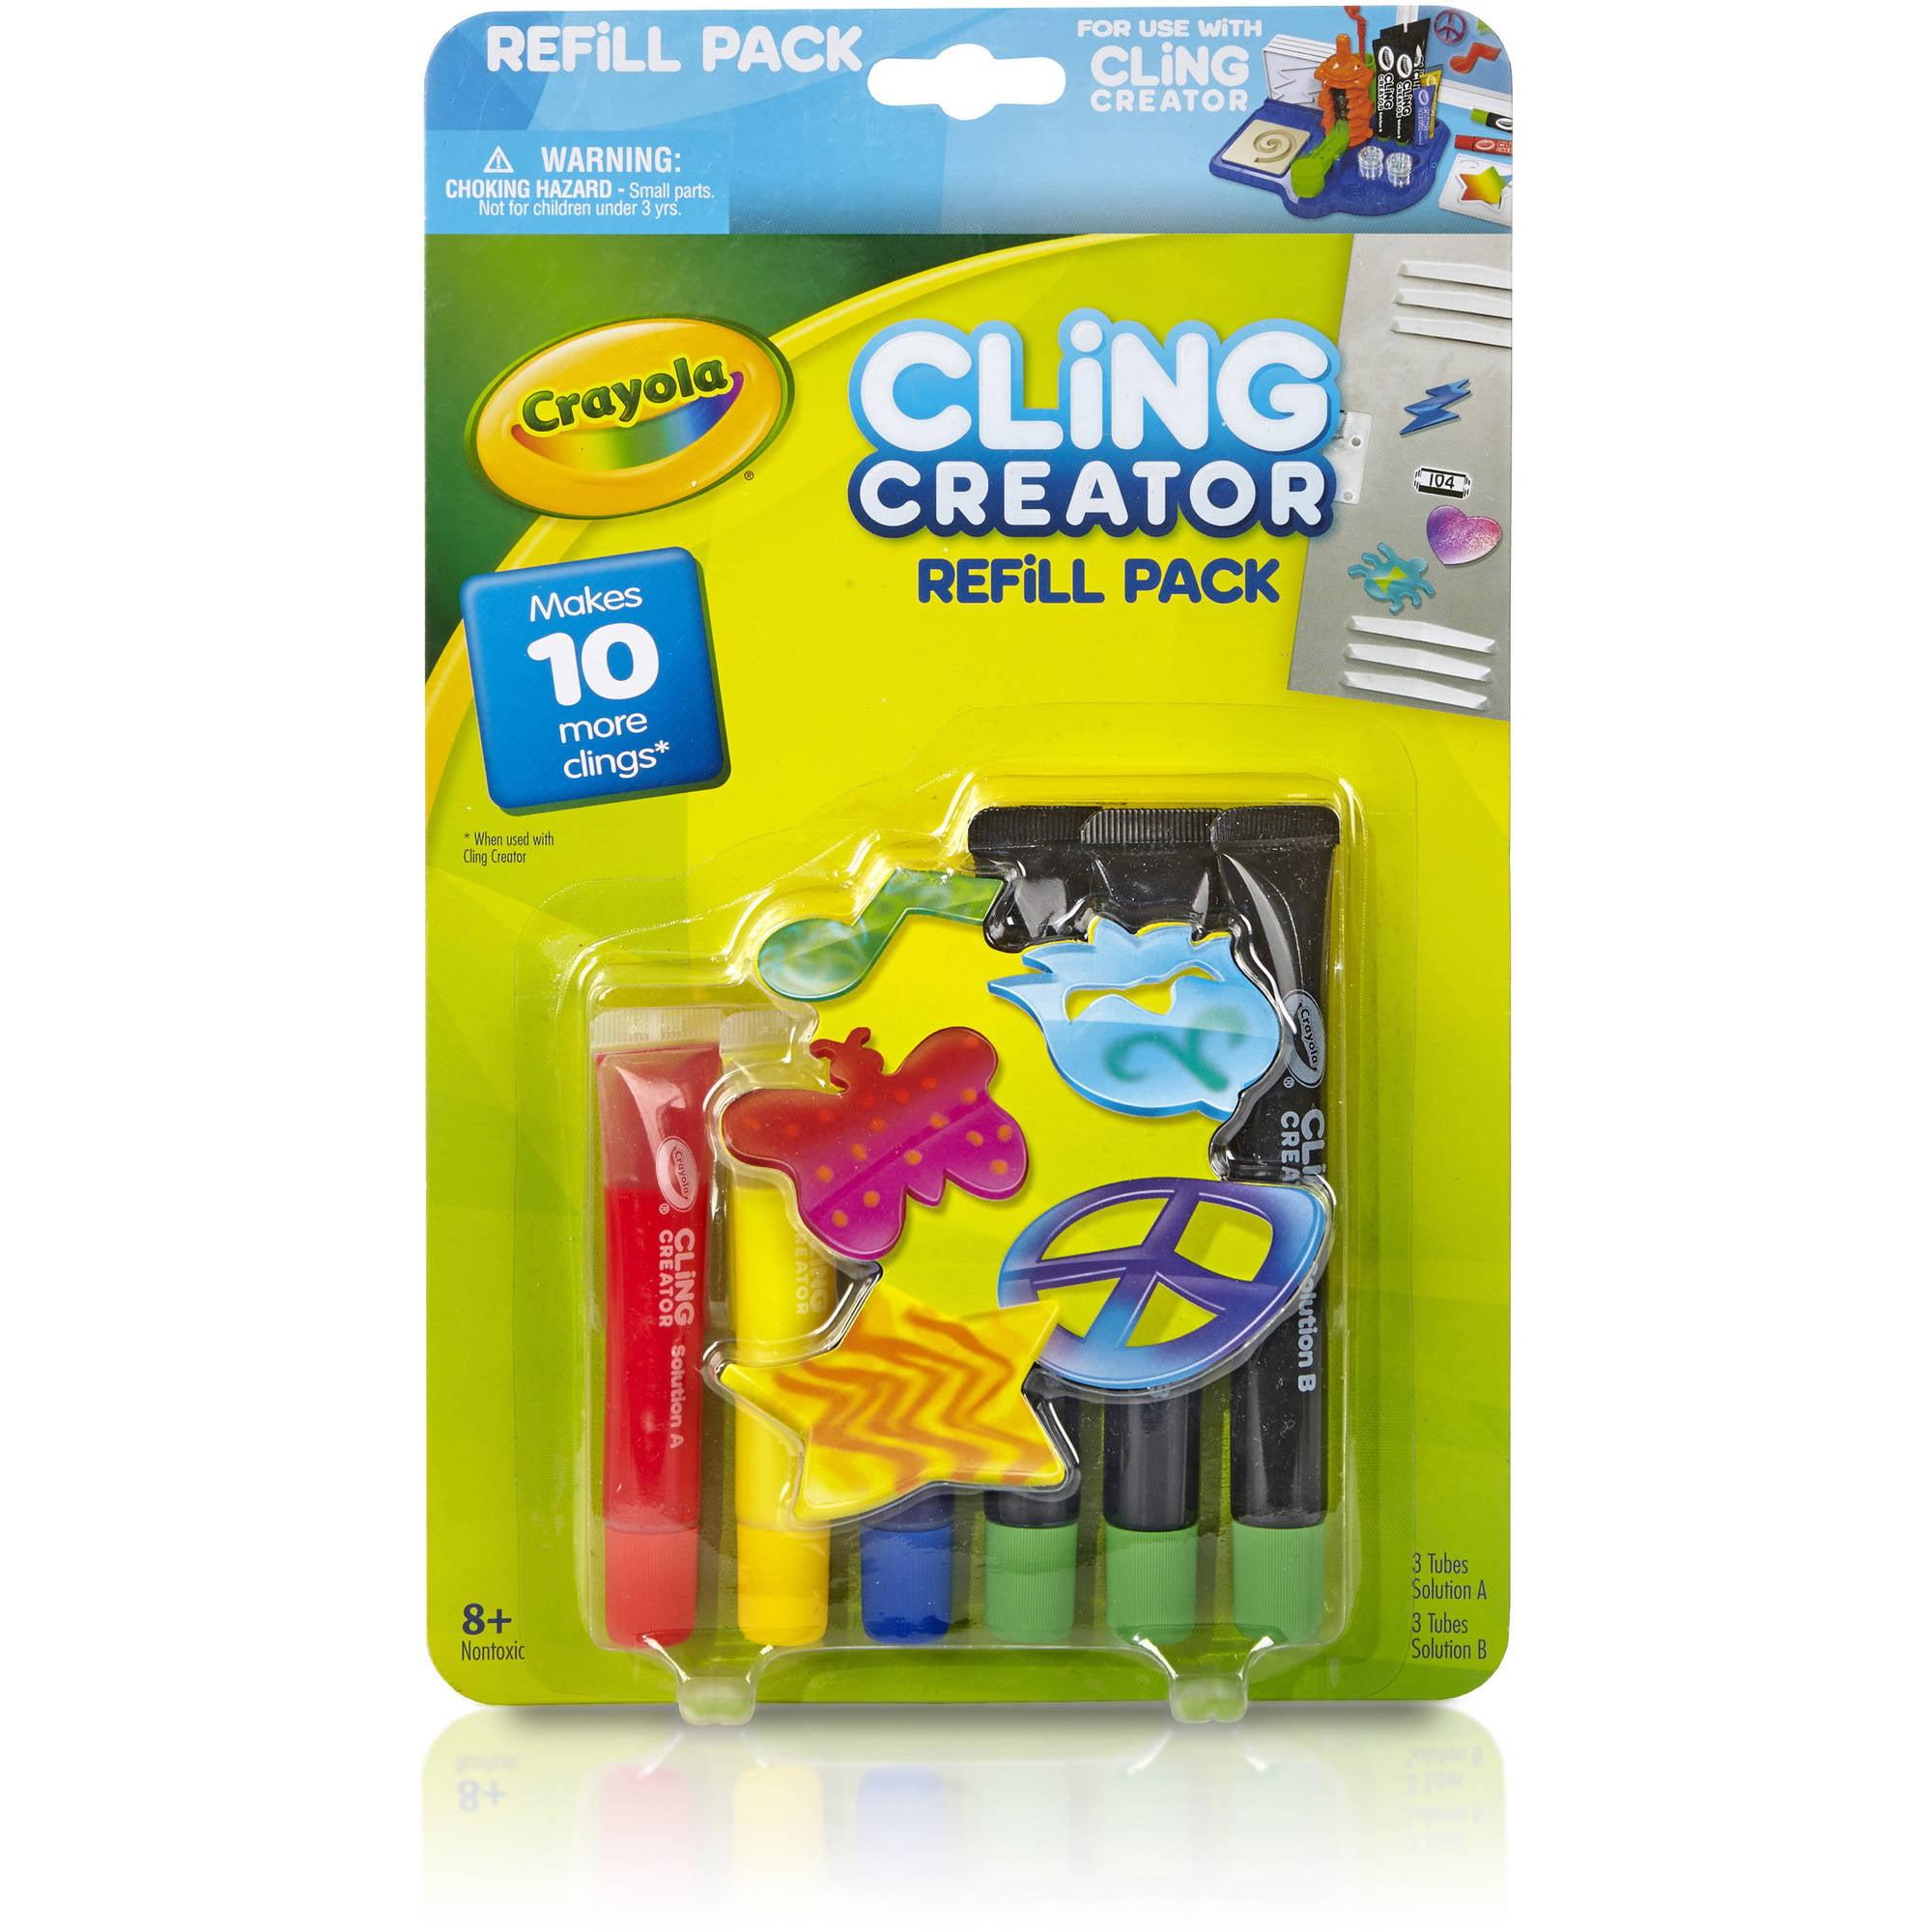 Crayola Cling Creator Refill by Crayola